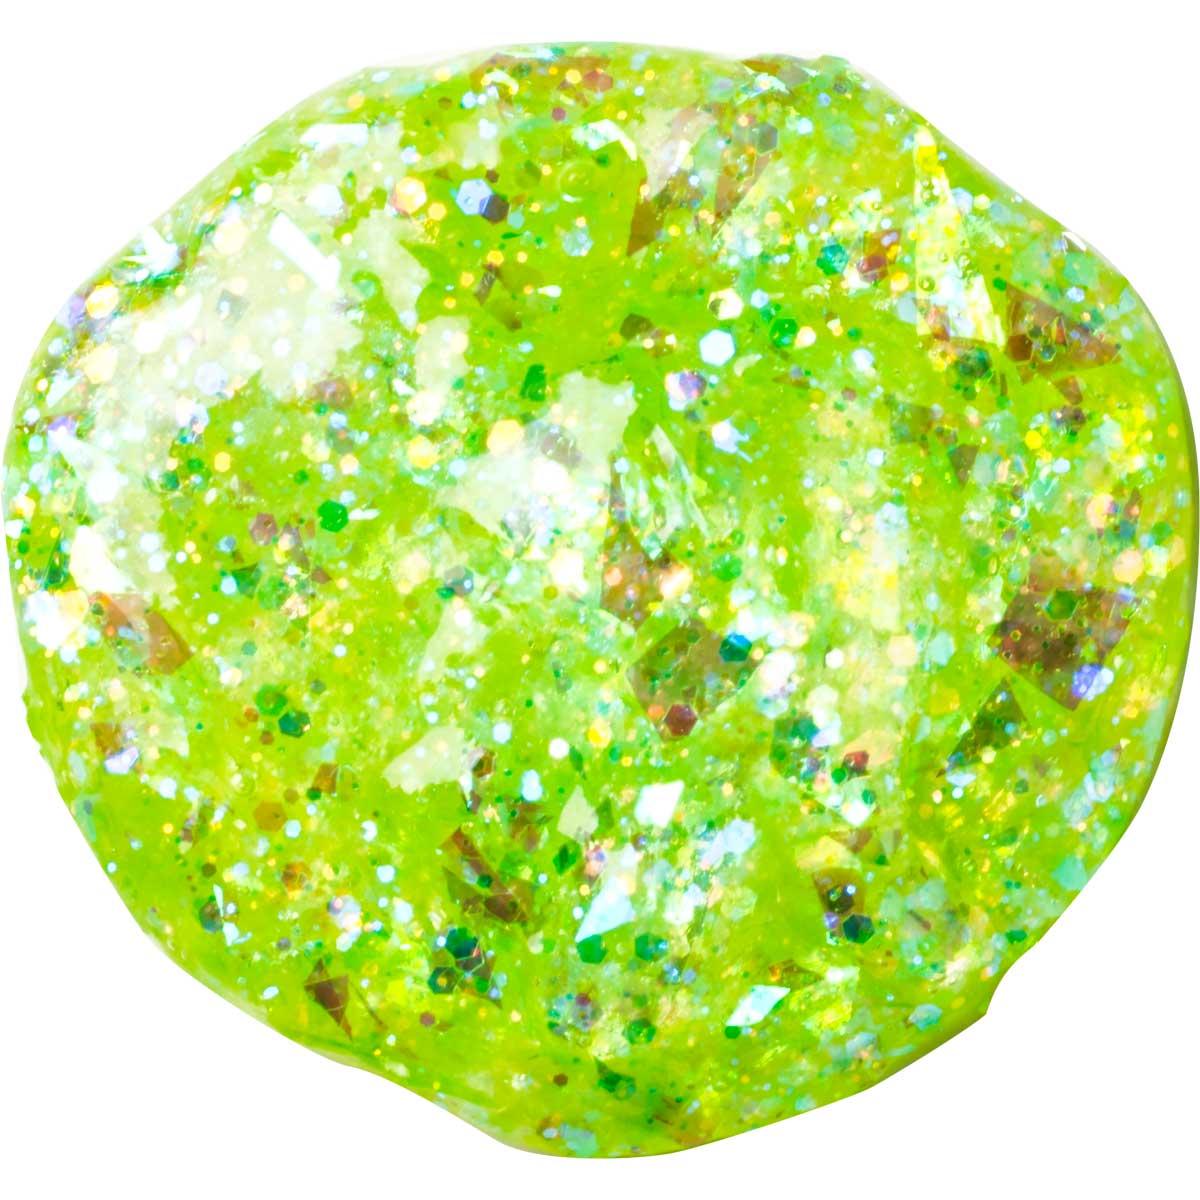 FolkArt ® Glitterific™ Acrylic Paint - Neon Lime, 2 oz. - 44389